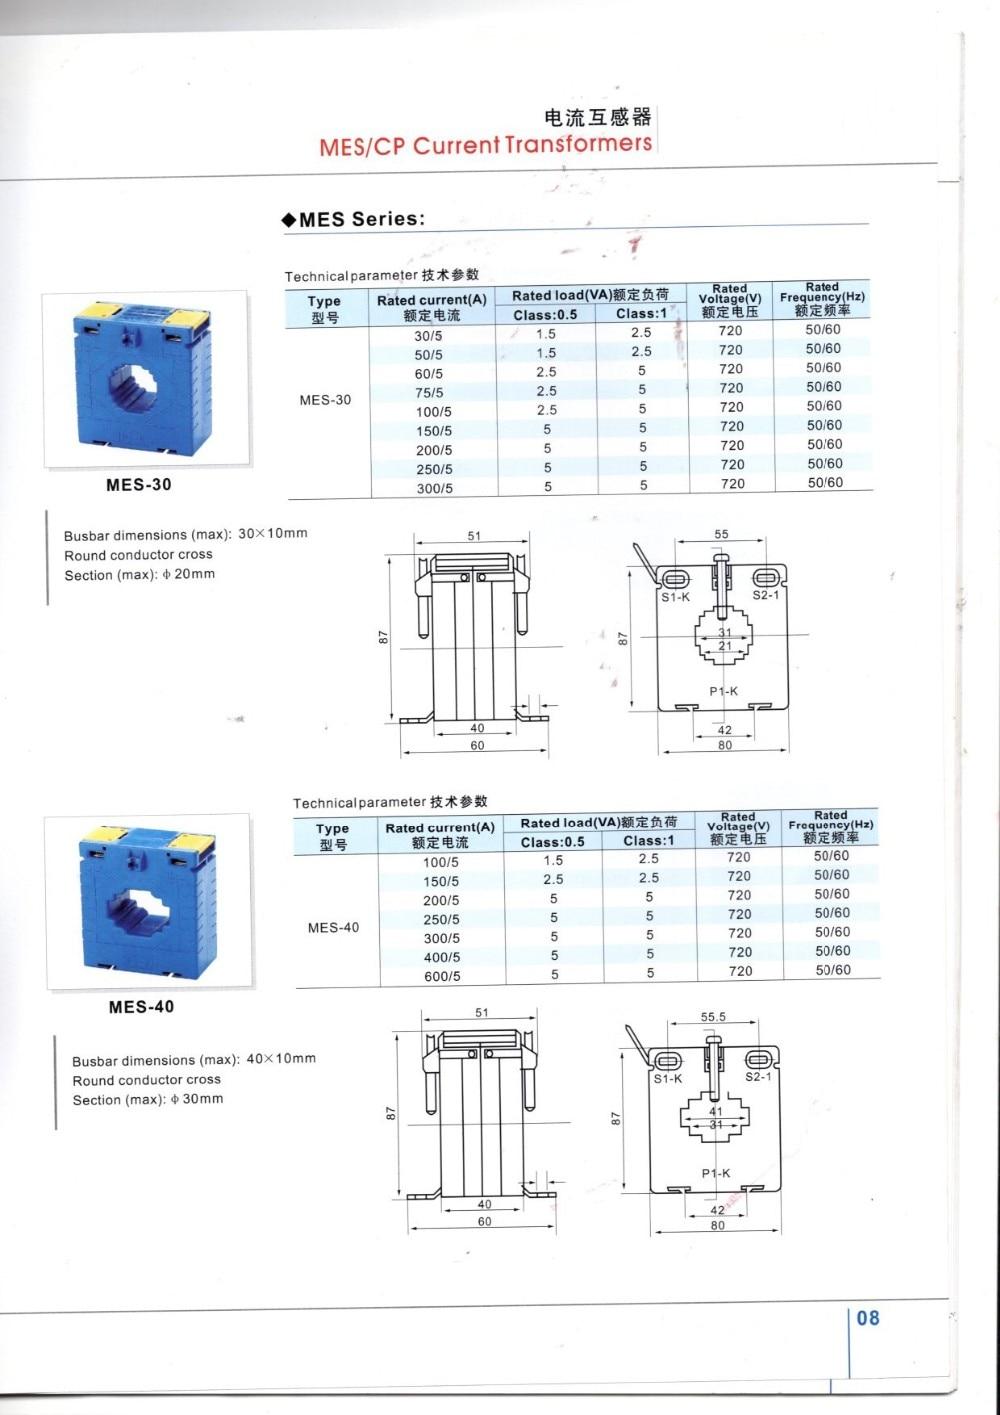 medium resolution of img413 img414 img415 img416 img417 img418